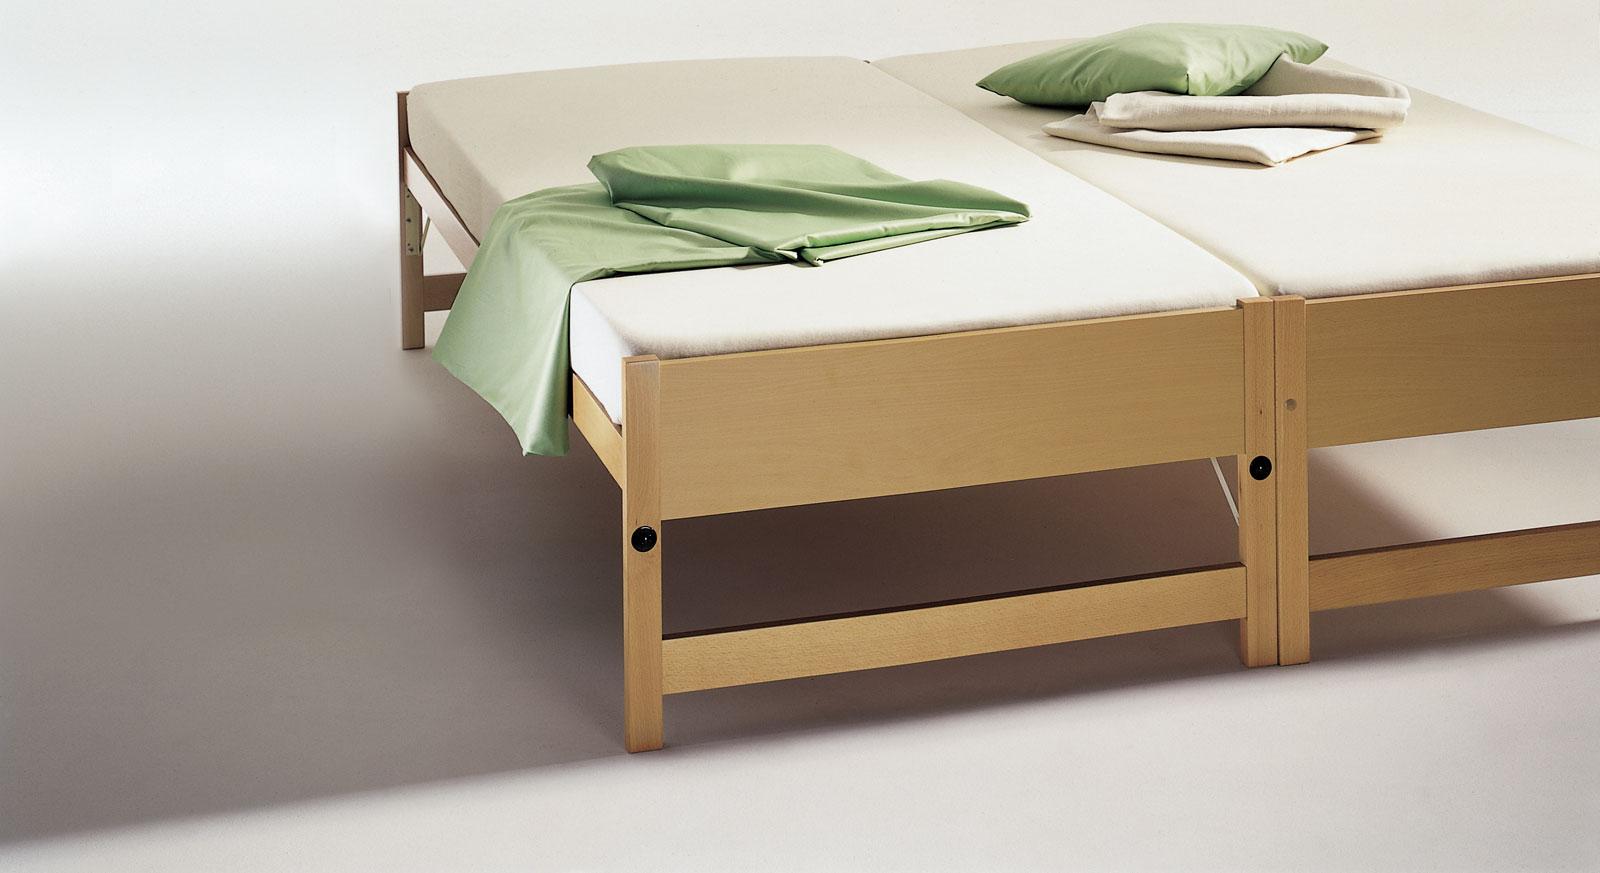 Full Size of Klappbar Bett Ikea Ausklappbares Sofa Englisch Ausklappbar Stauraum Wandbefestigung 180x200 Zum Doppelbett Zwei Betten Gleicher Gre Unser Ausziehbett On Top Bett Bett Ausklappbar